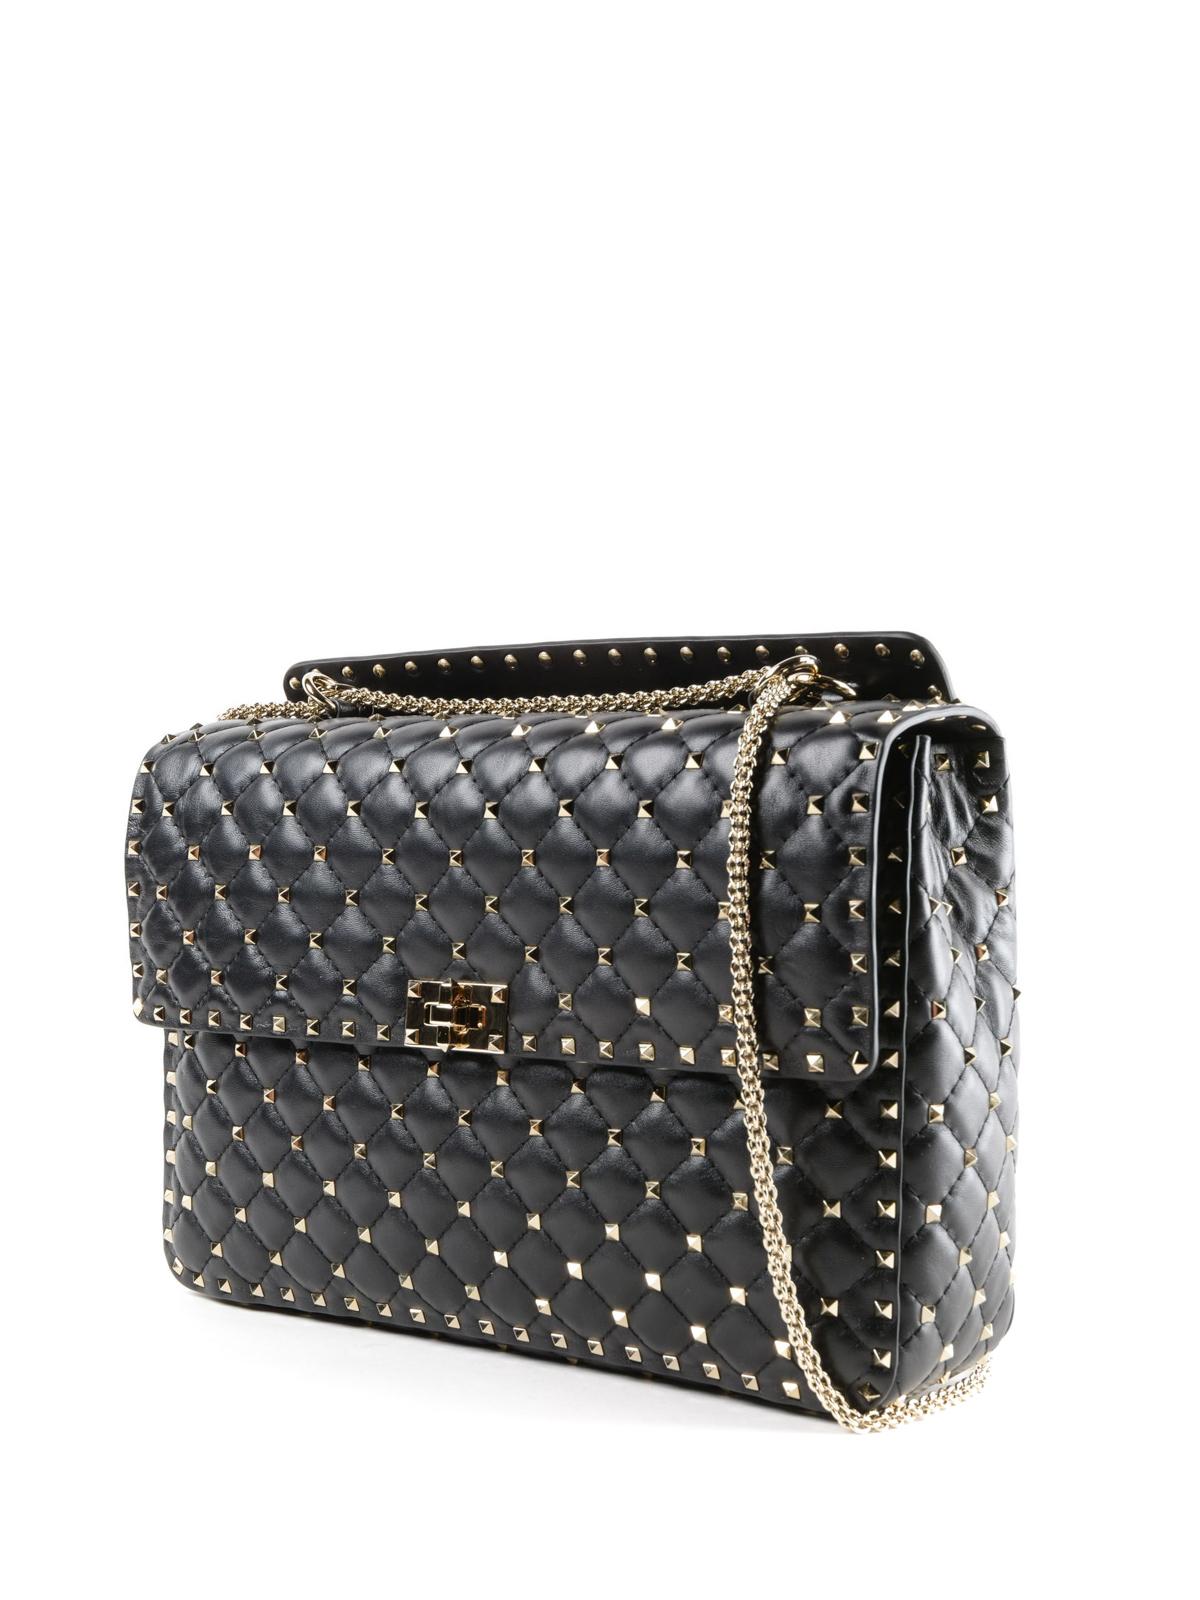 VALENTINO GARAVANI  borse a spalla online - Borsa Rockstud Spike in pelle  matelassé 5180993ff85